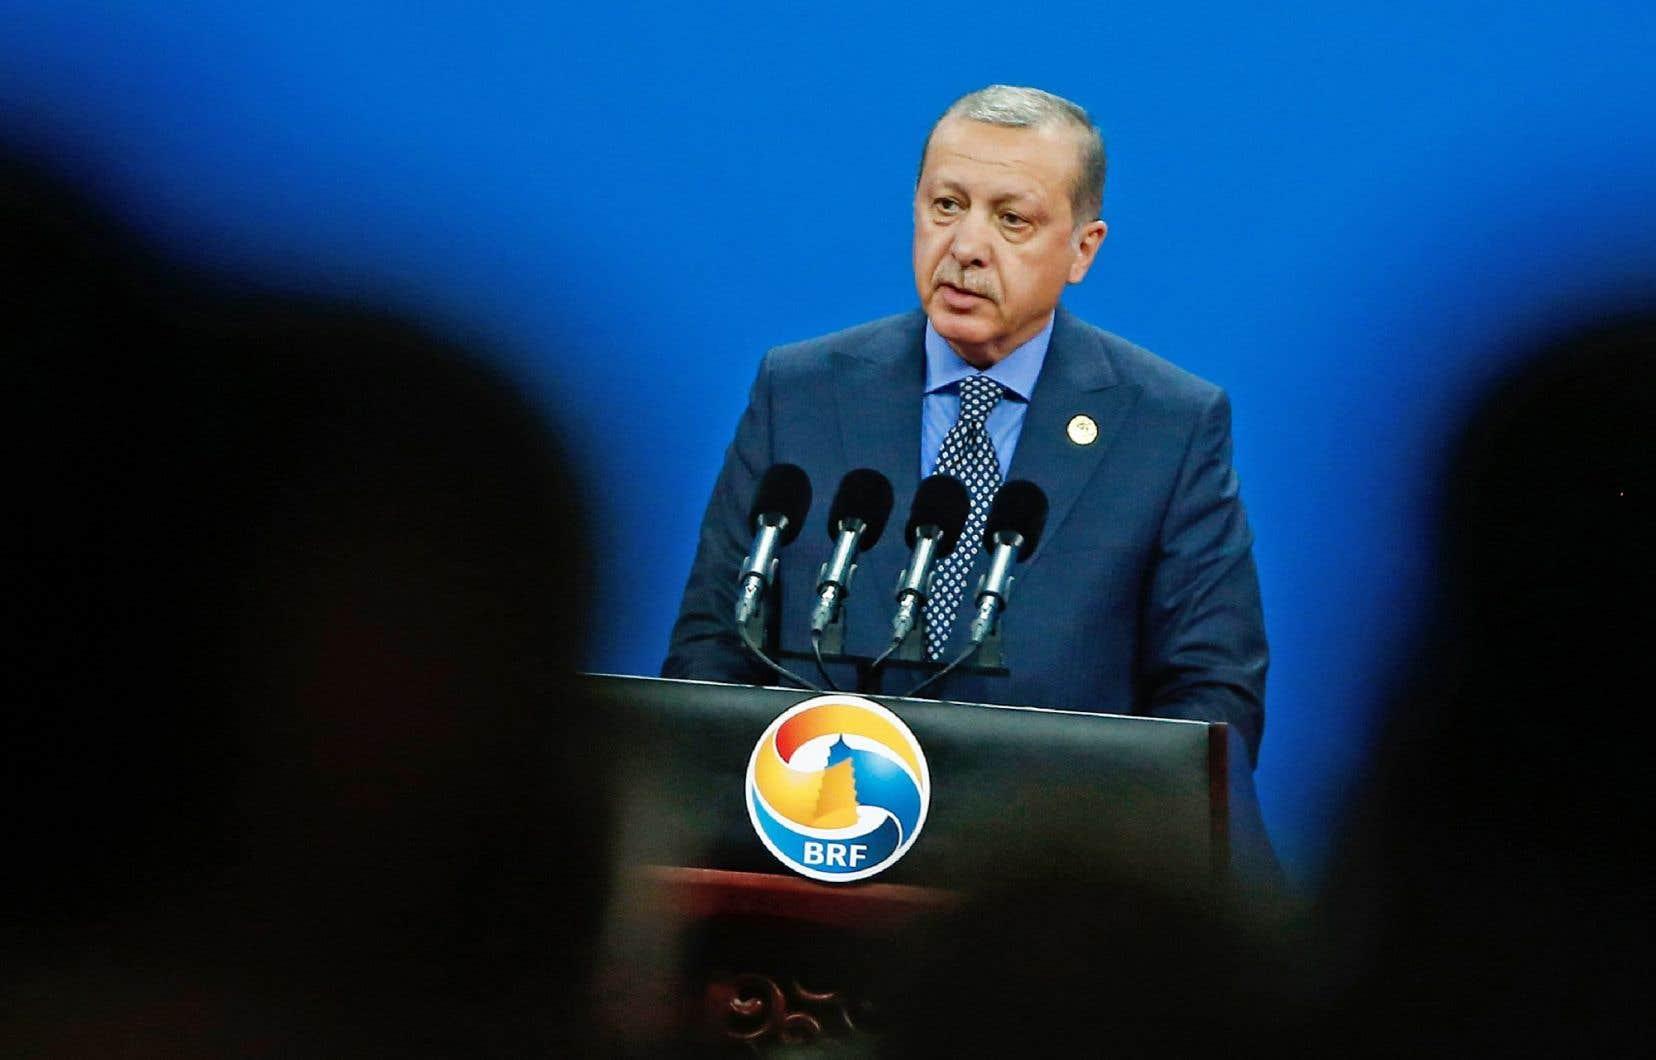 Le président turc sera de passage à Washington mardi.